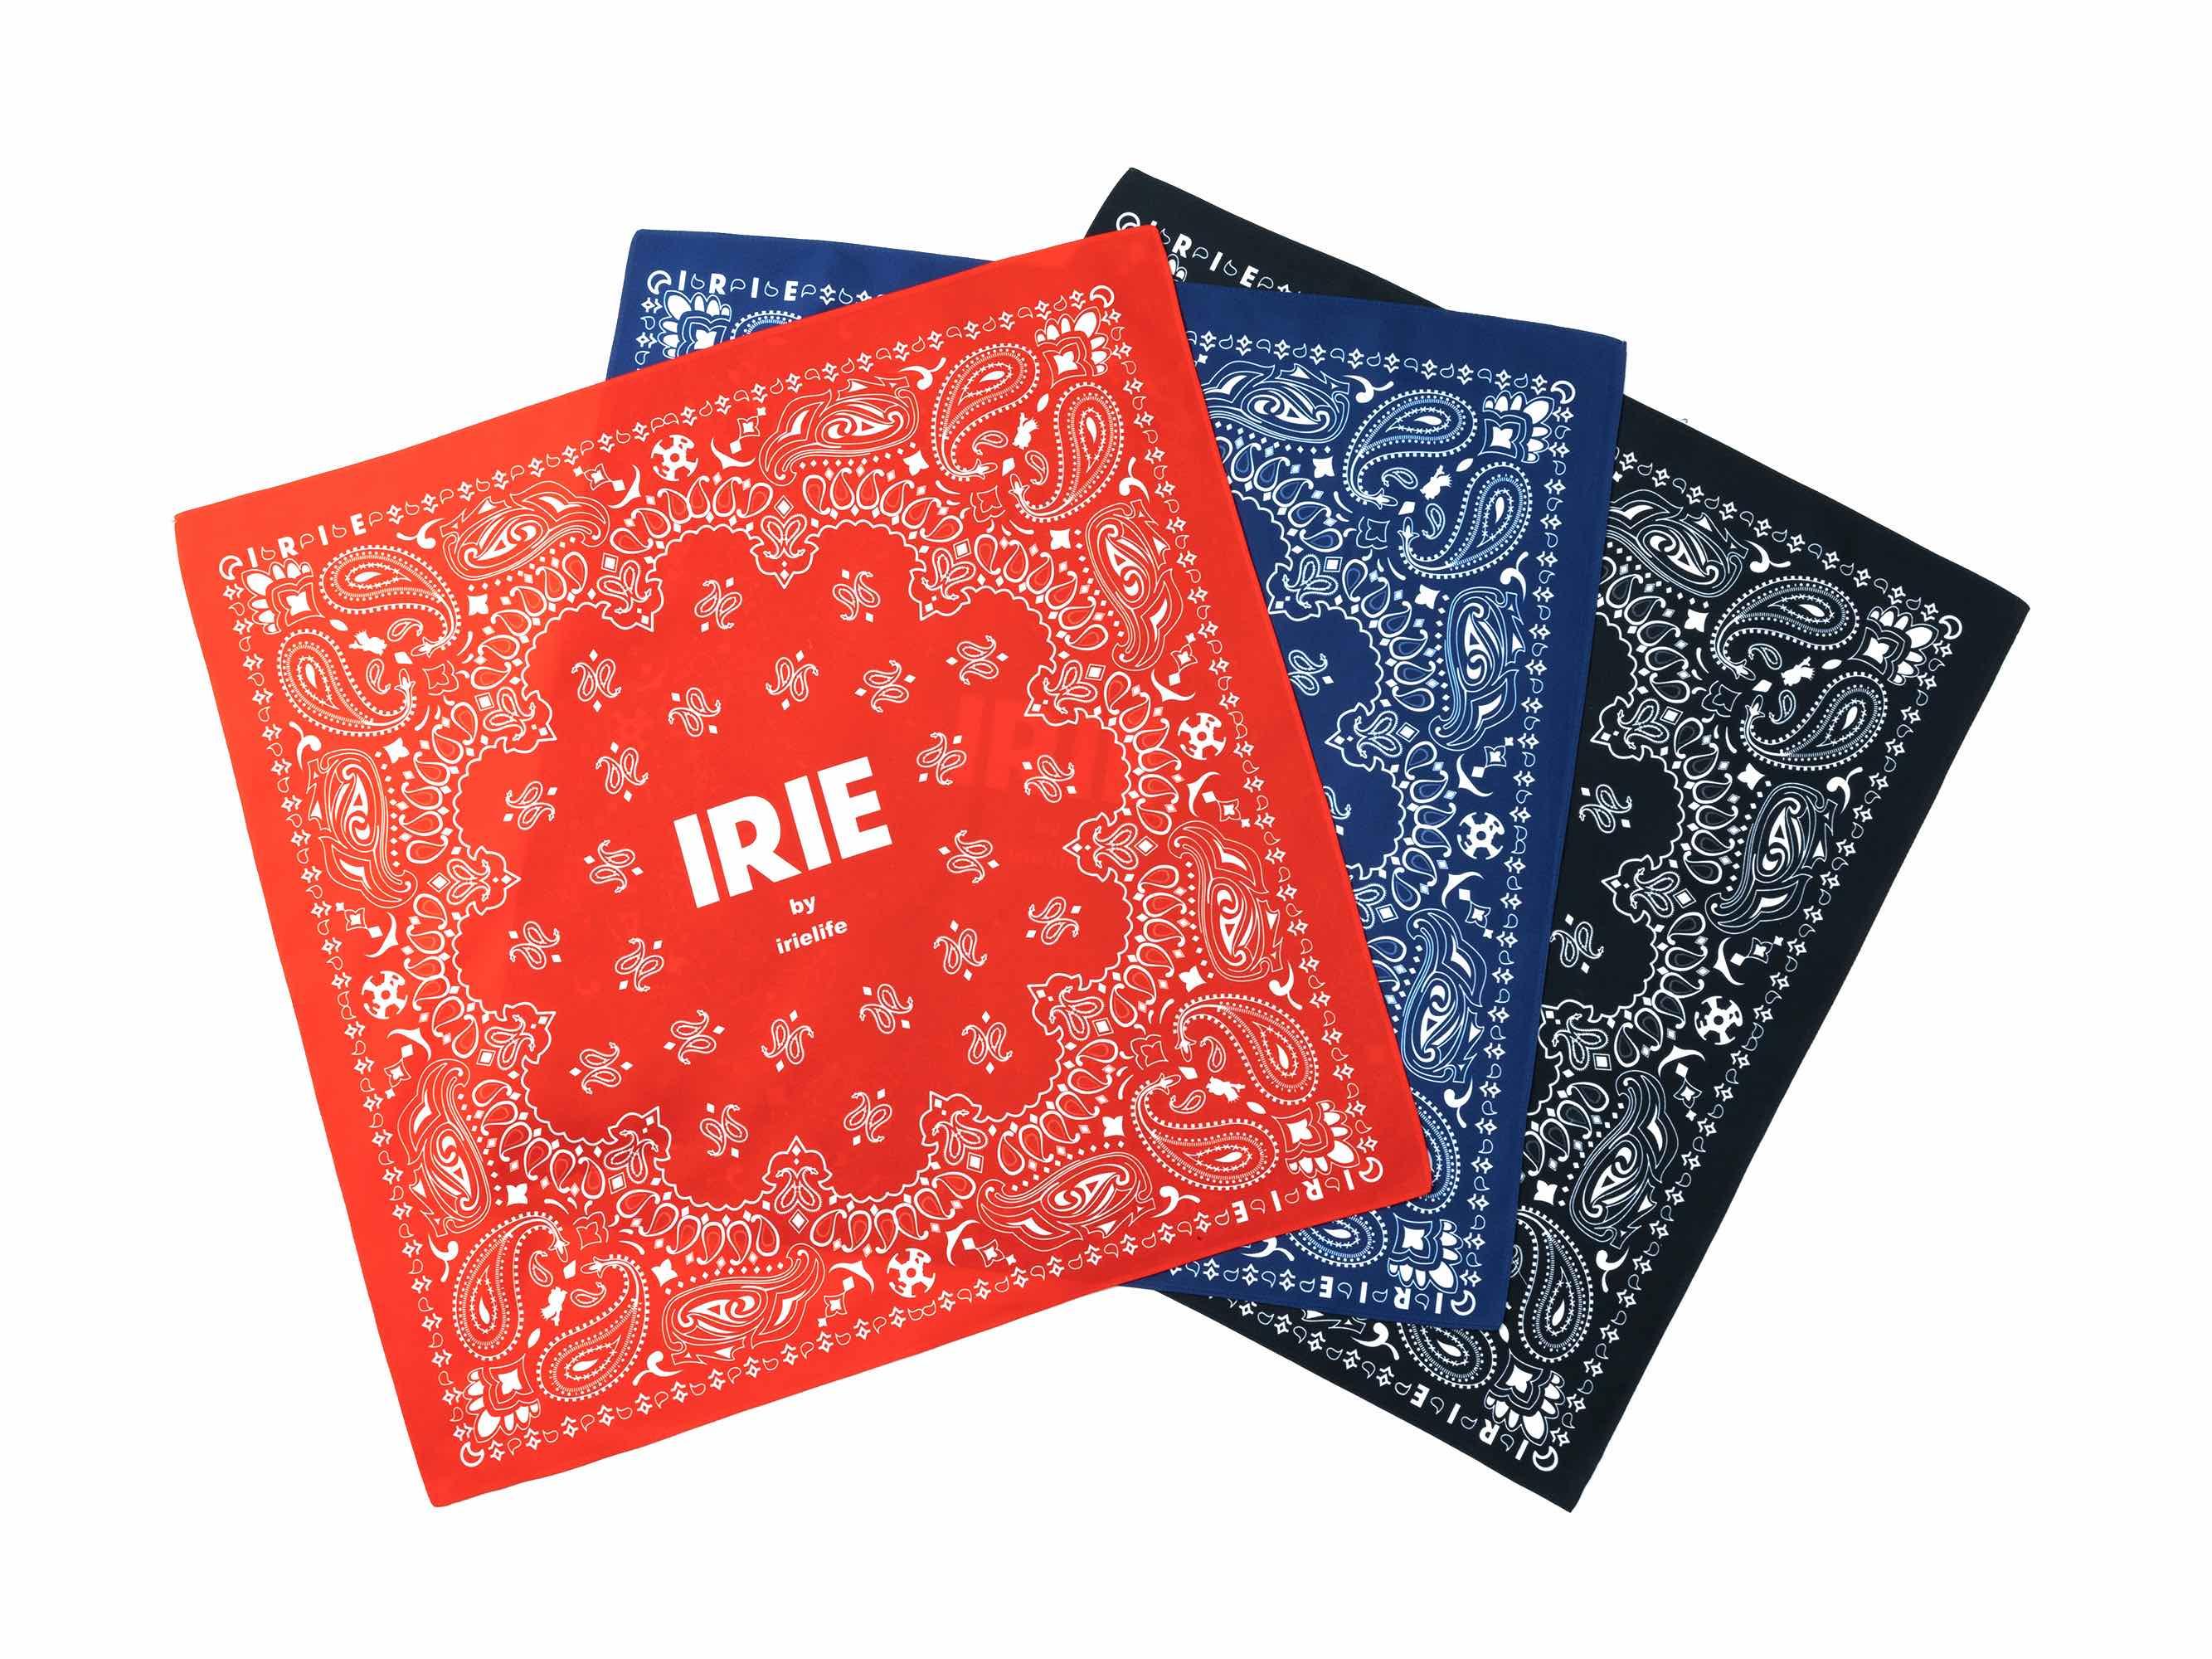 IRIE PAISLEY BANDANA - IRIE by irielife